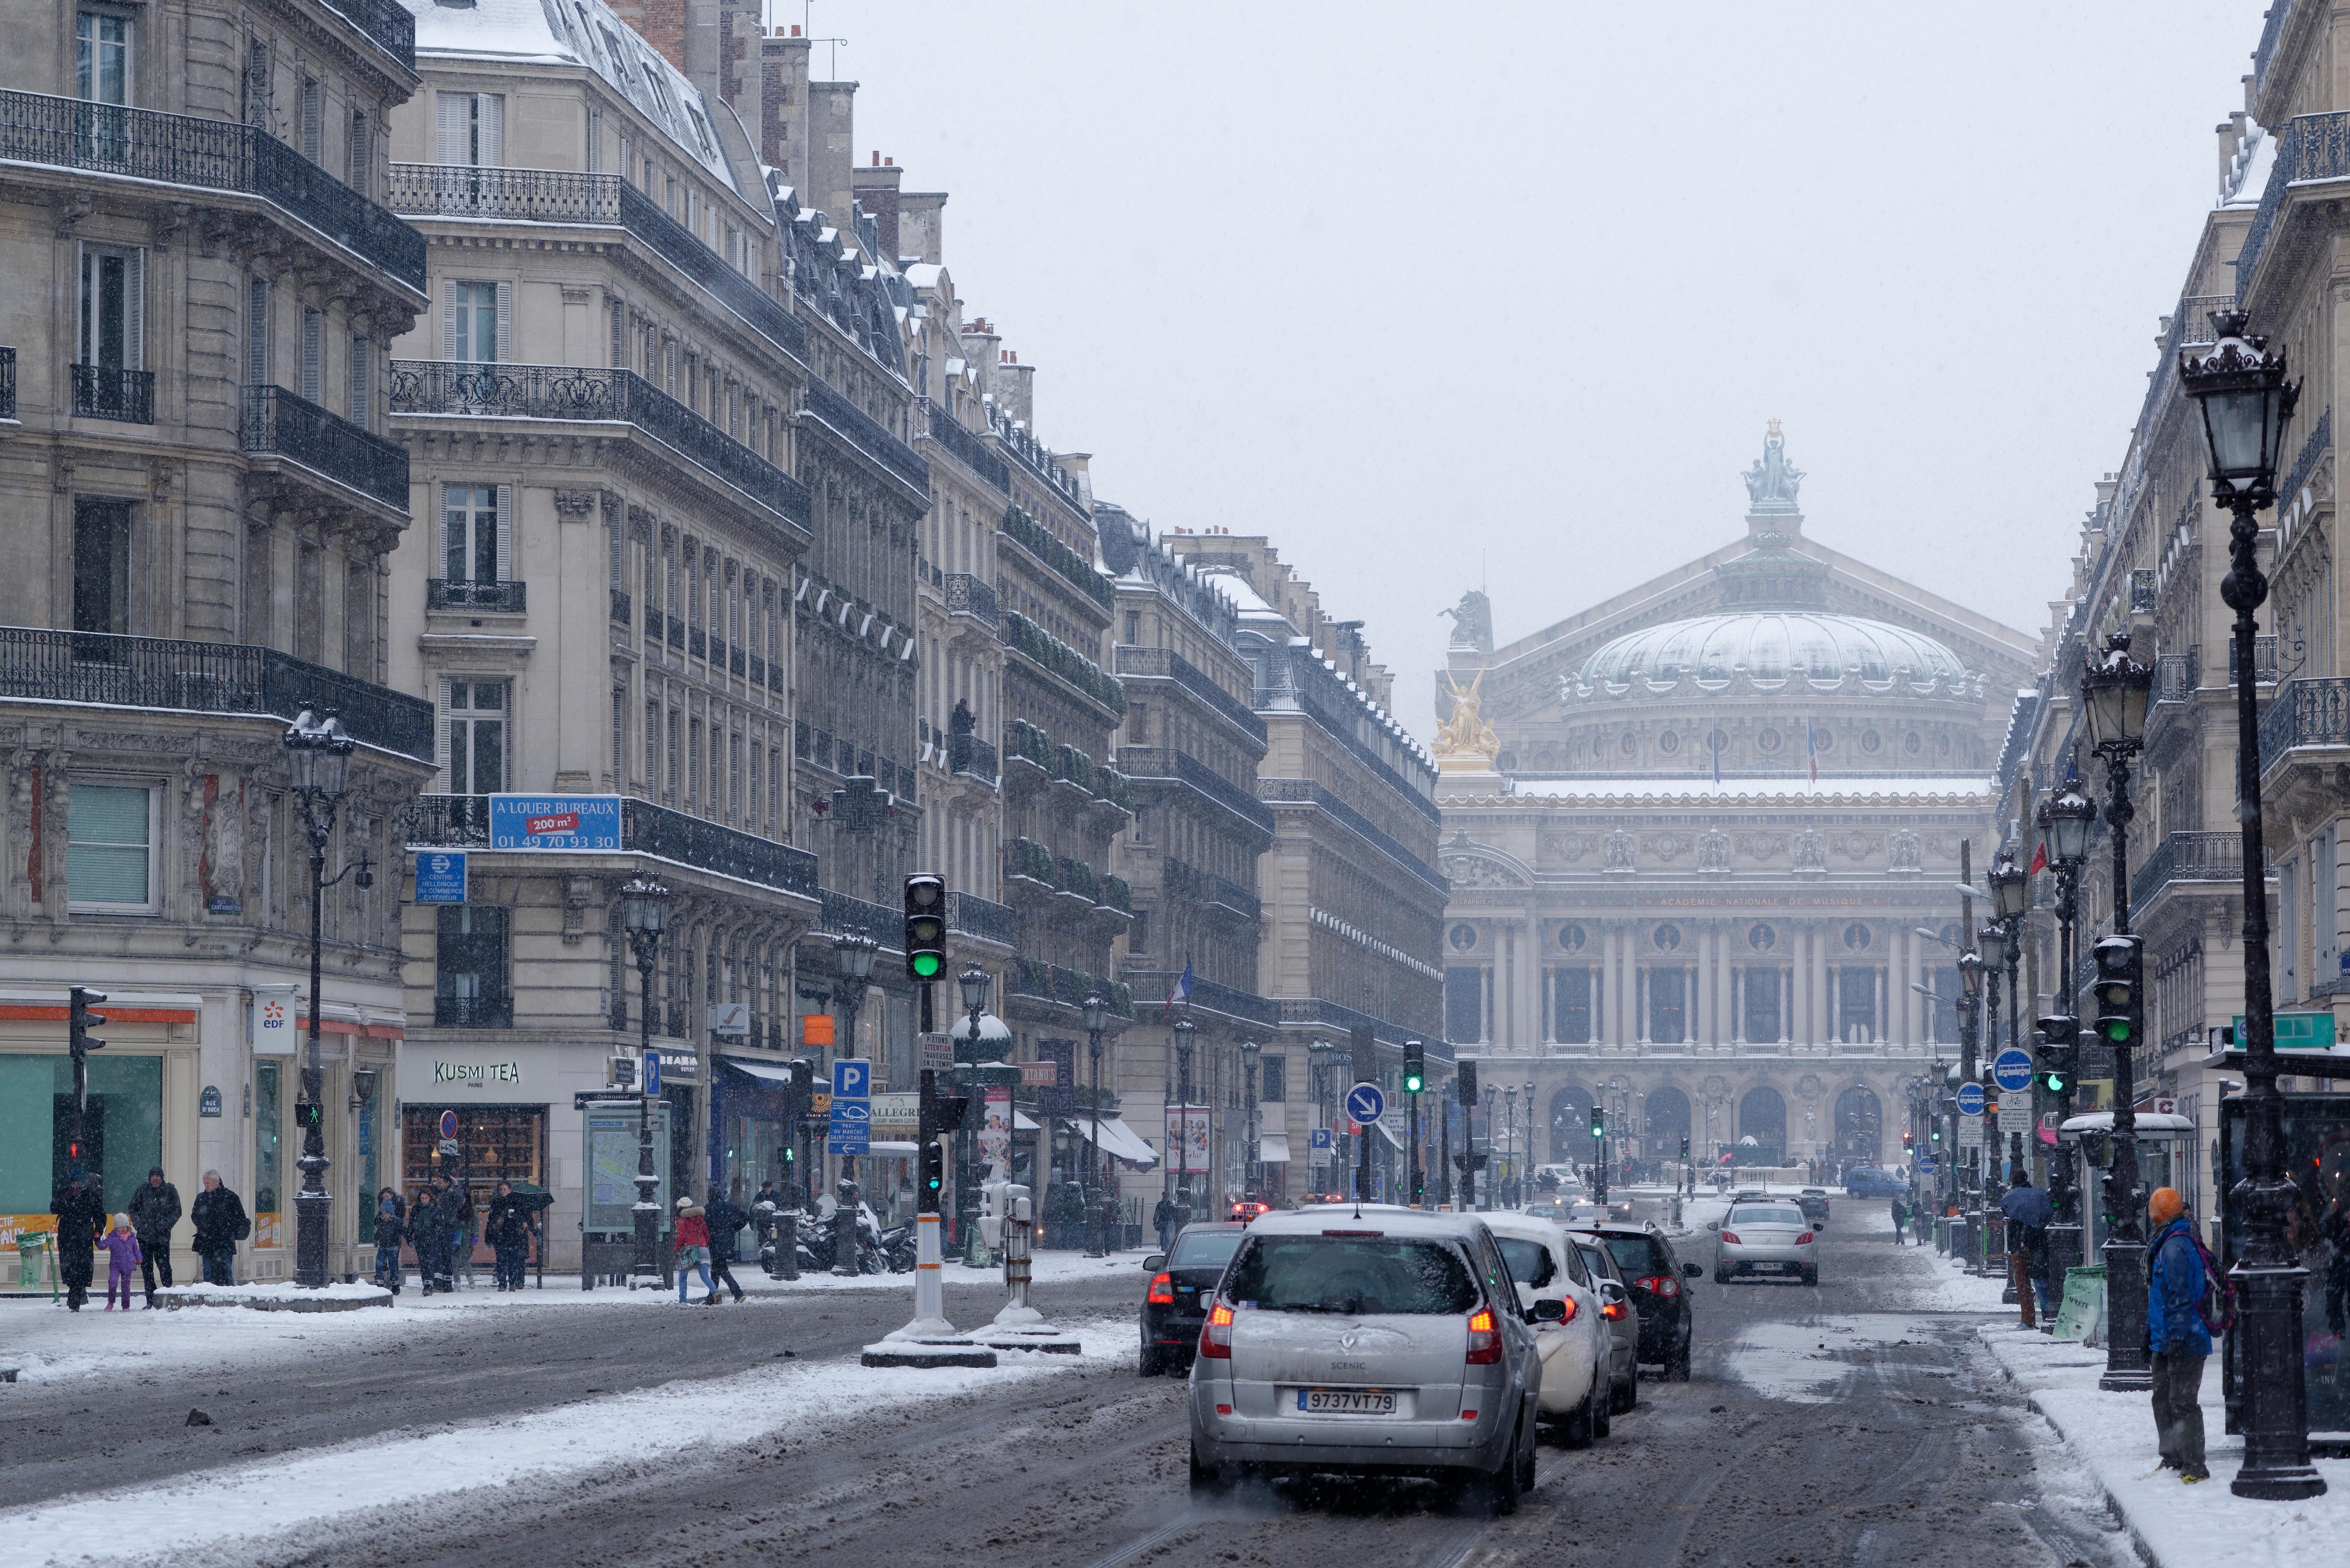 Description Avenue de Opera Paris under the snow 2013-01-20.jpg